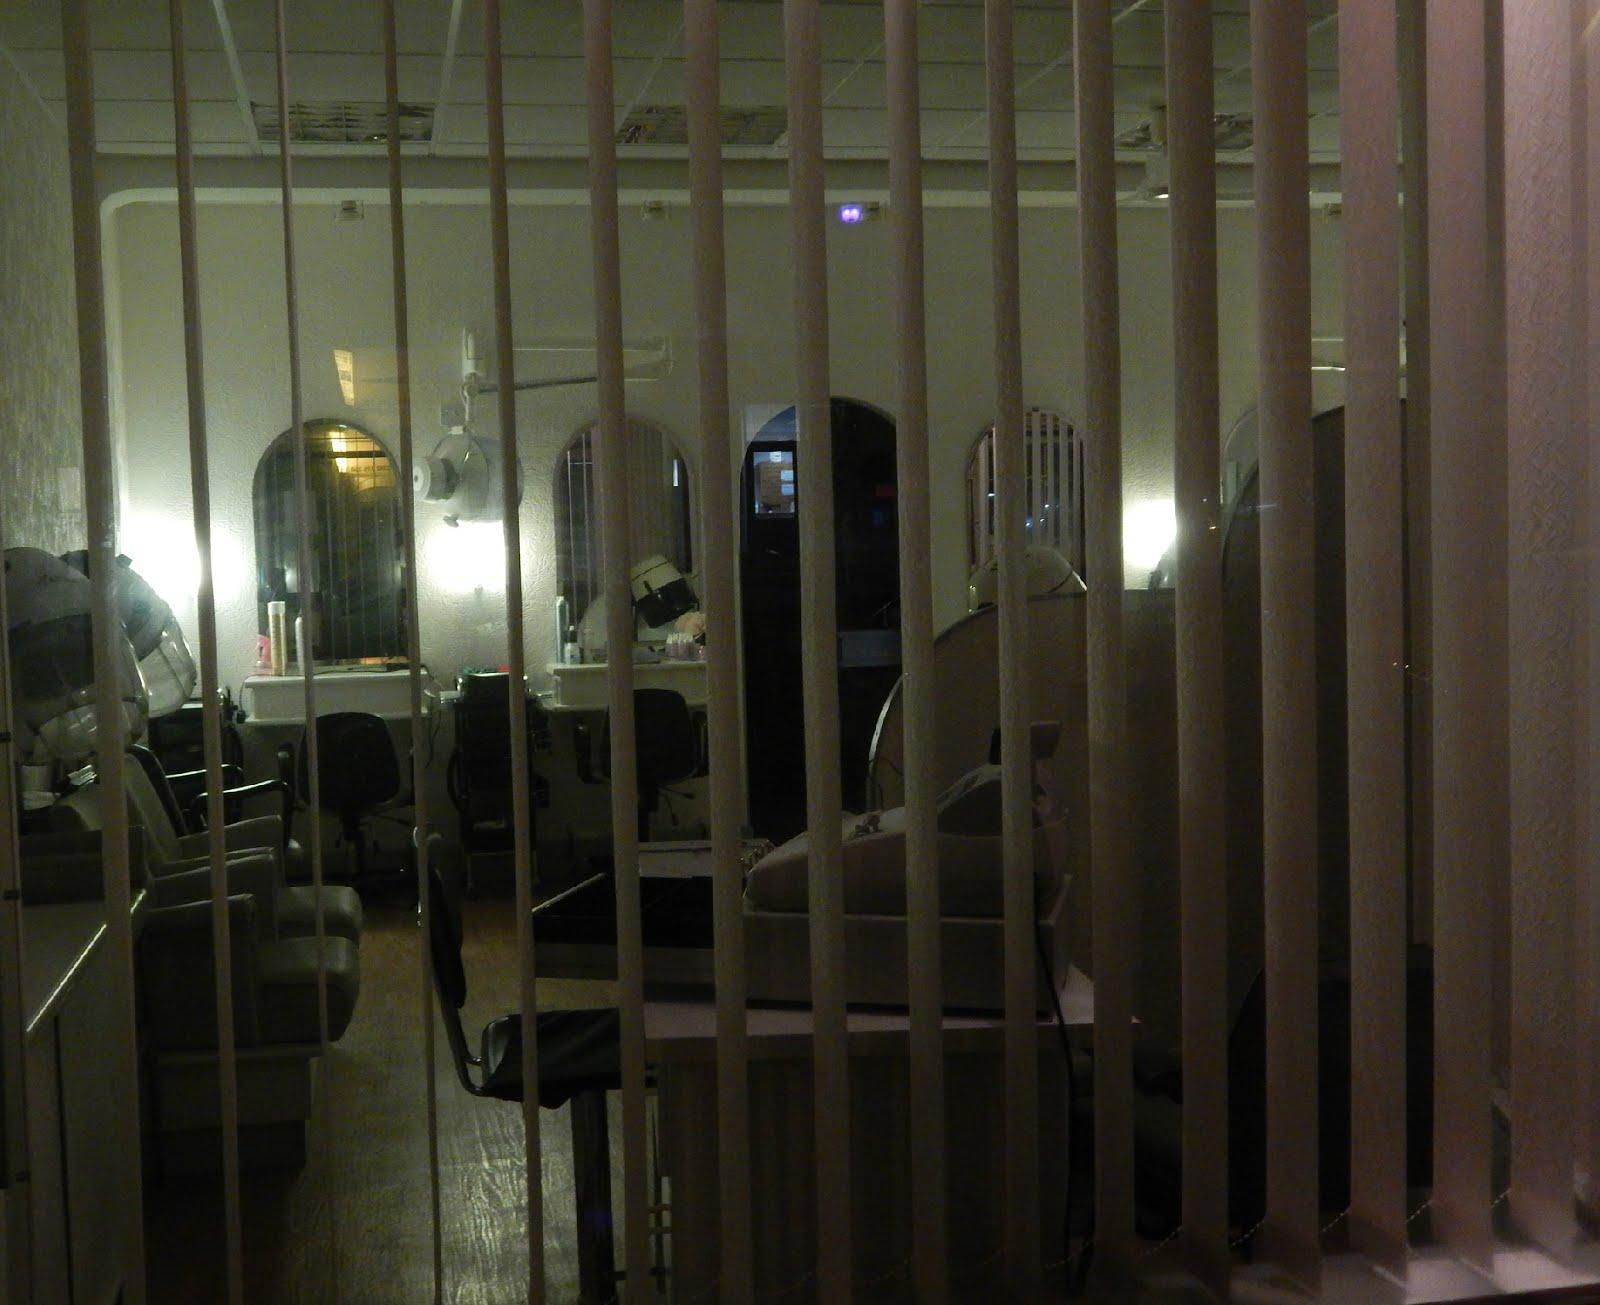 Inside Maison Drayton